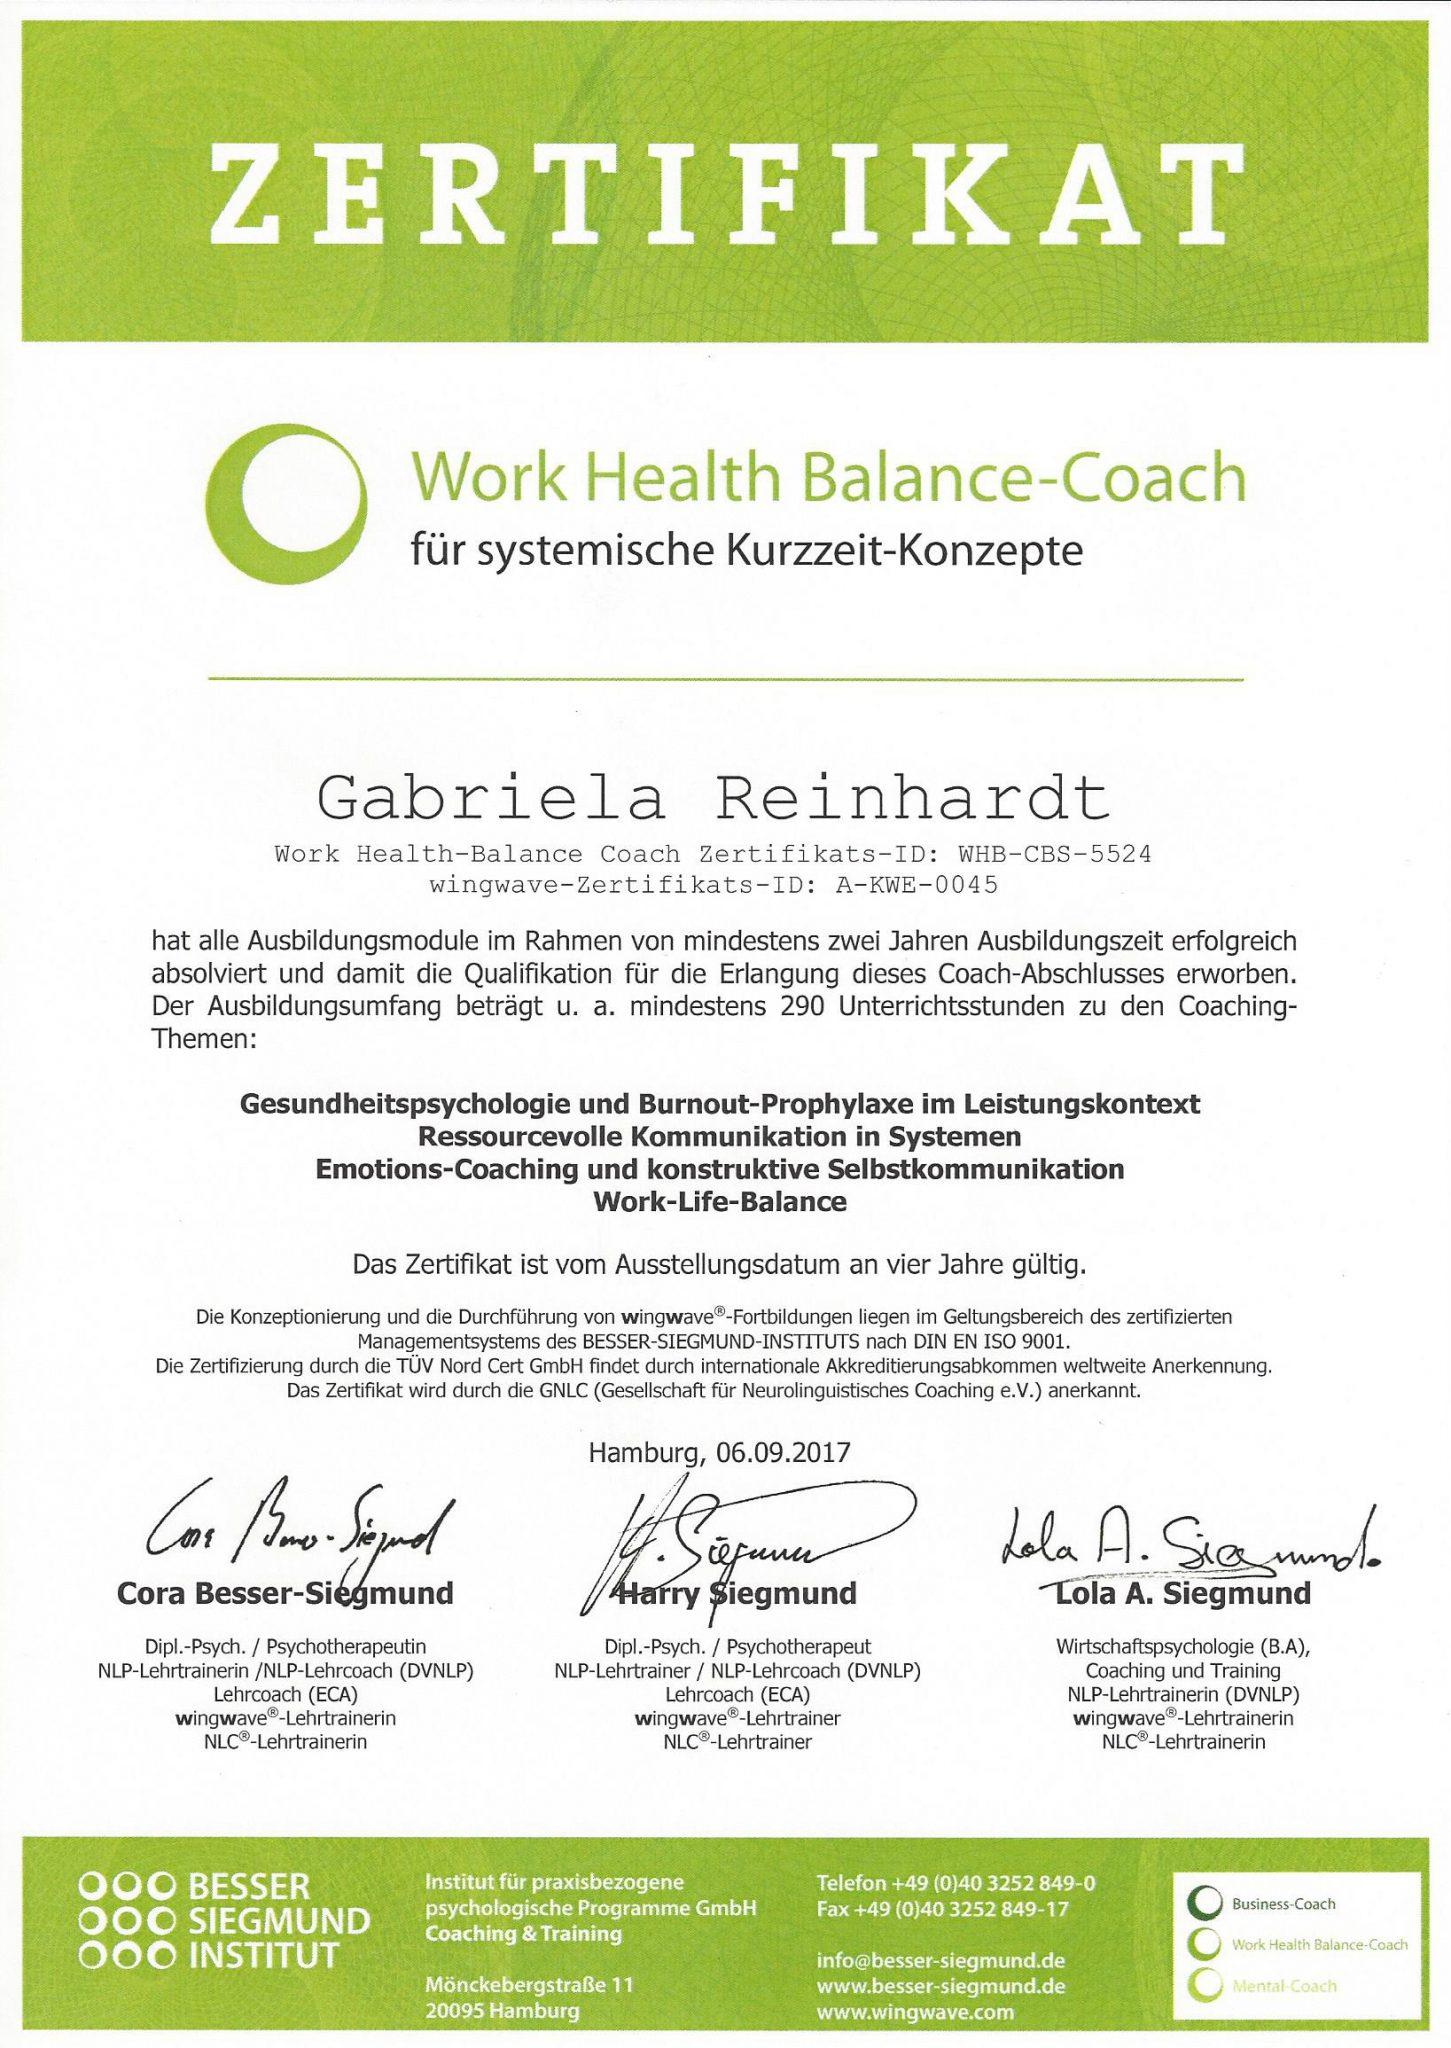 RGH-Consulting | Gabriela Reinhardt | Zertifikate | Zertifikat Work-Health-Balance-Coach